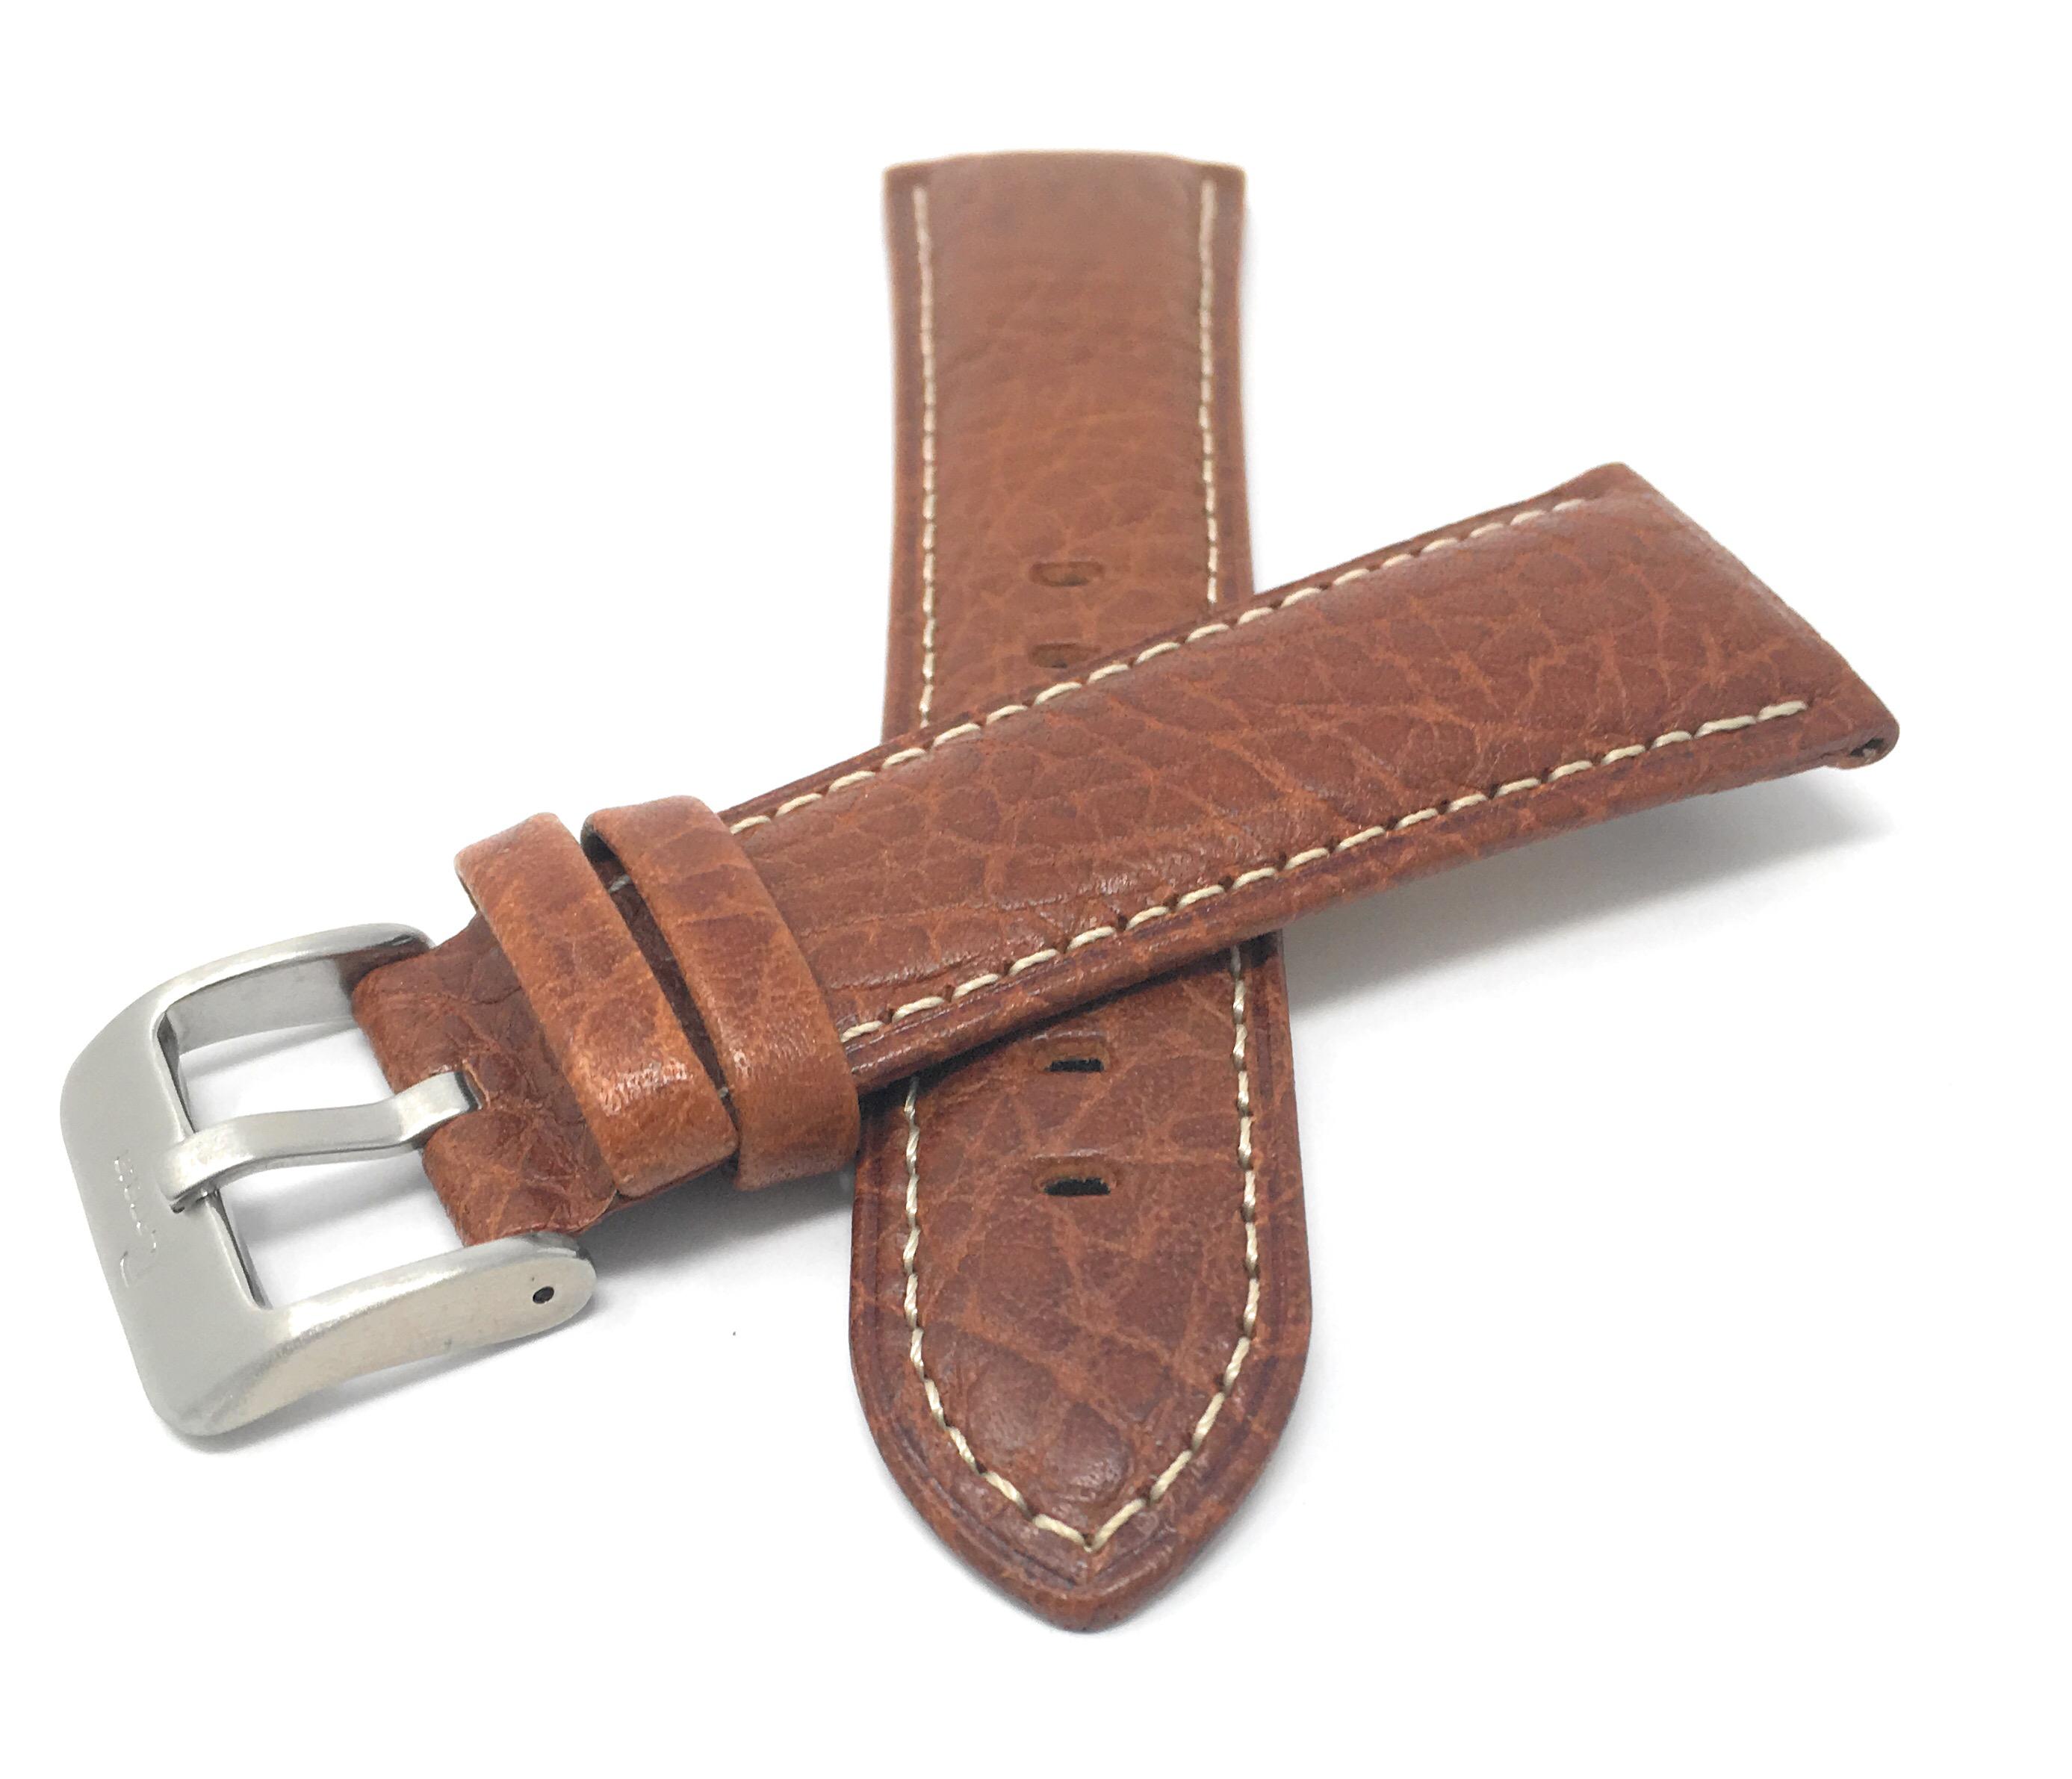 Bandini-Mens-Italian-Leather-Watch-Band-Strap-Padded-Stitch-18mm-19mm-20mm-24mm thumbnail 6